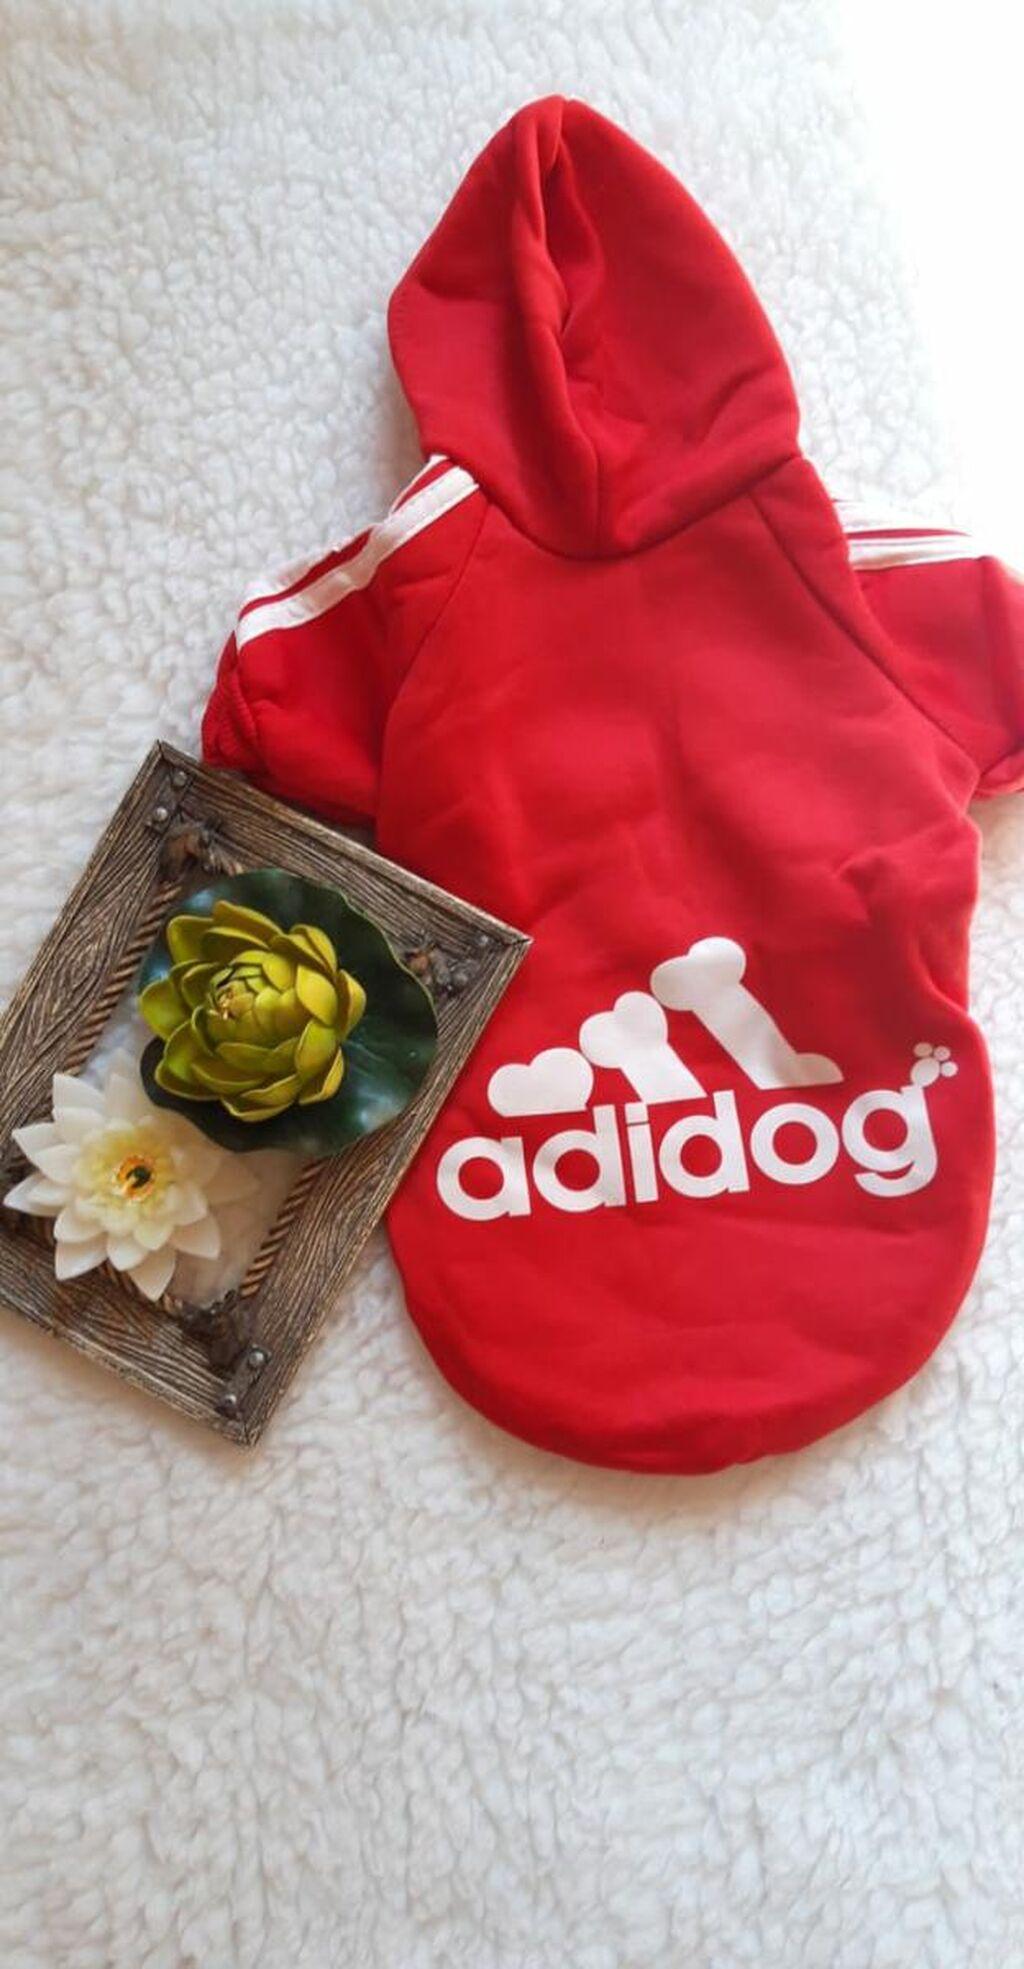 Adidog duksevi za pse -1000 din